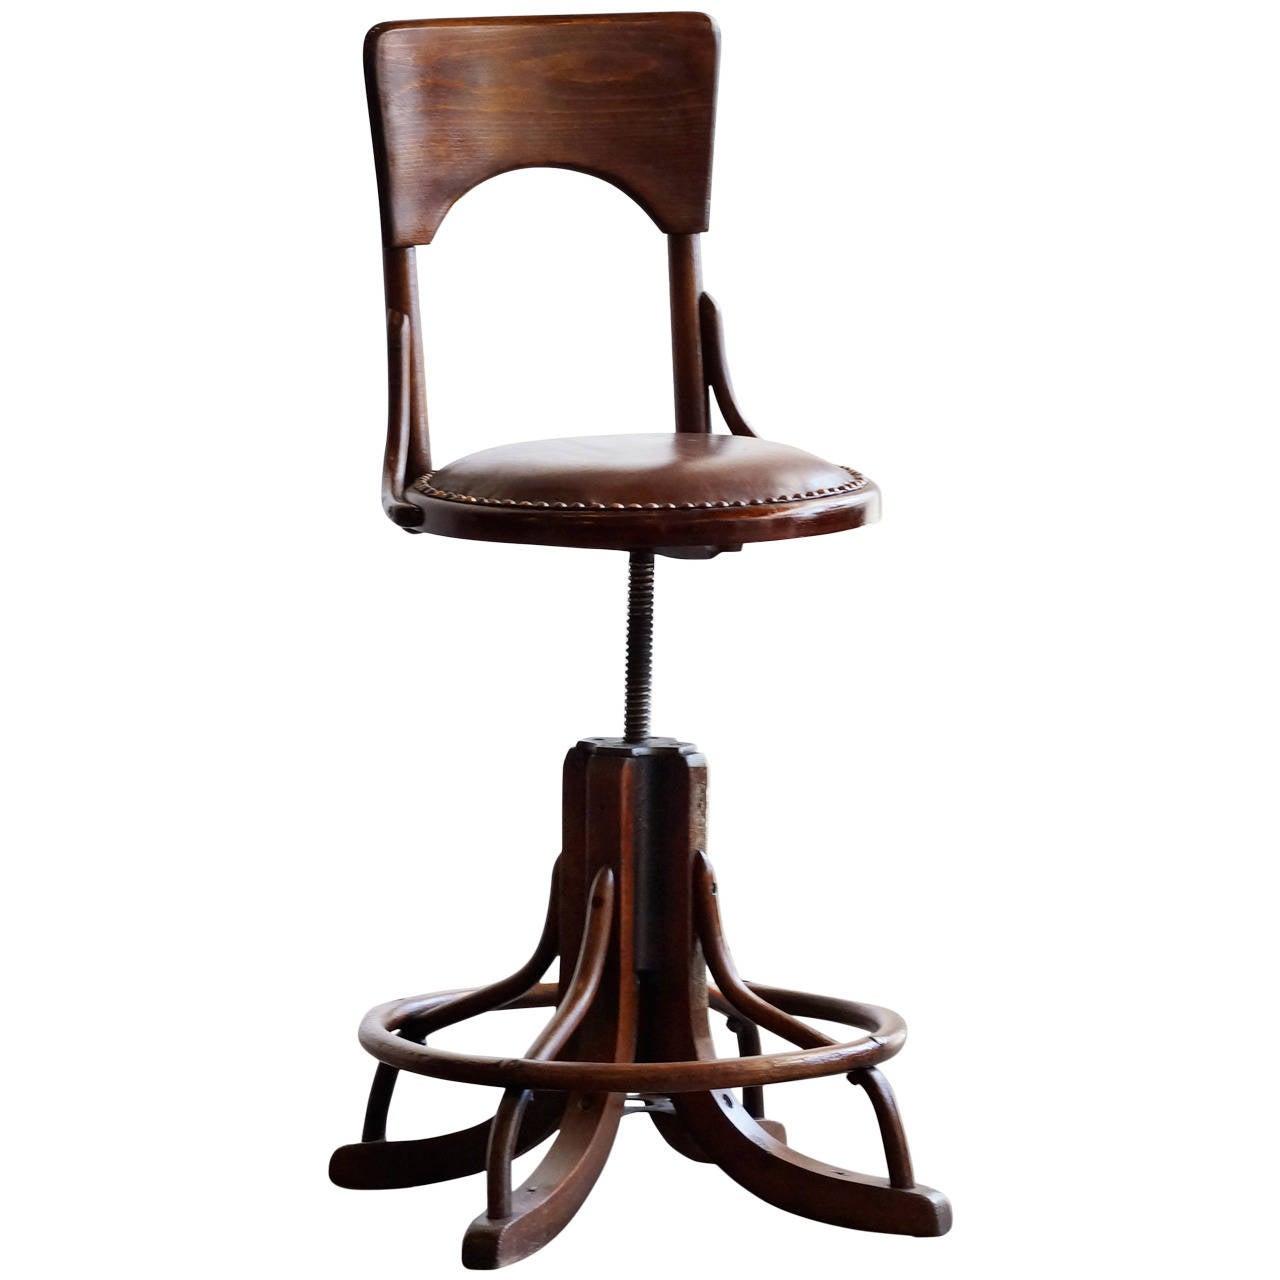 Vintage Drafting Chairs